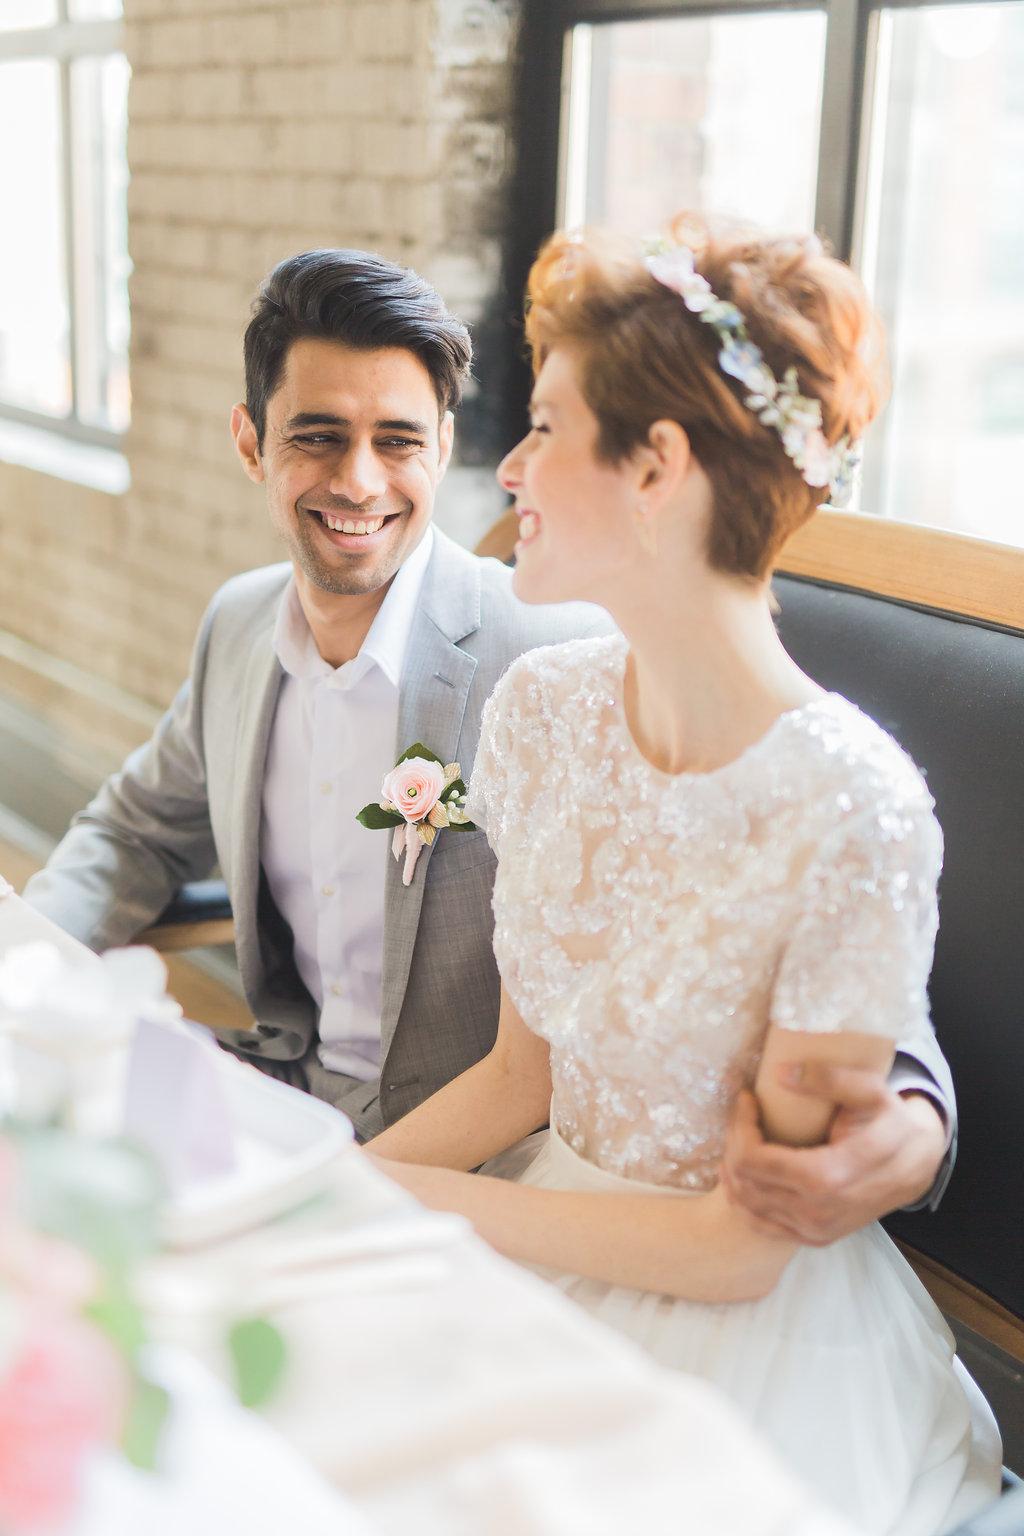 Phoebe Lo Events Toronto Wedding - Storys Building Urban Loft Paper Inspired Wedding 025.jpg